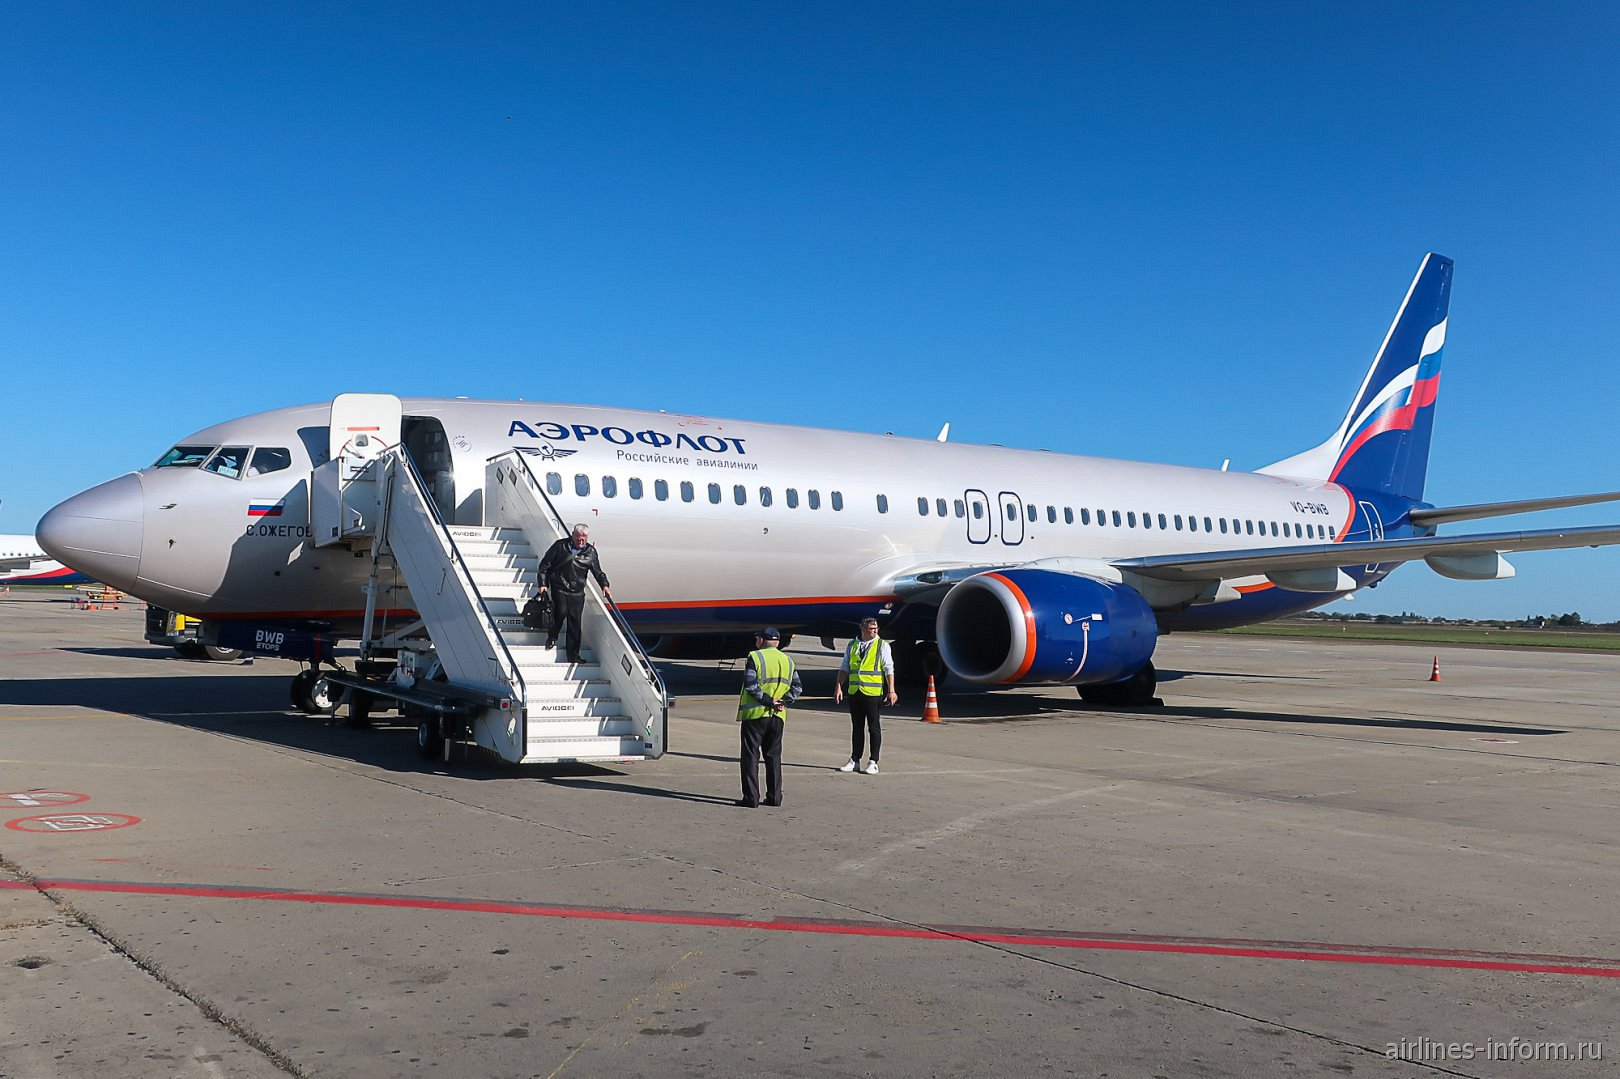 Самолет Боинг-737-800 Аэрофлота в аэропорту Краснодара